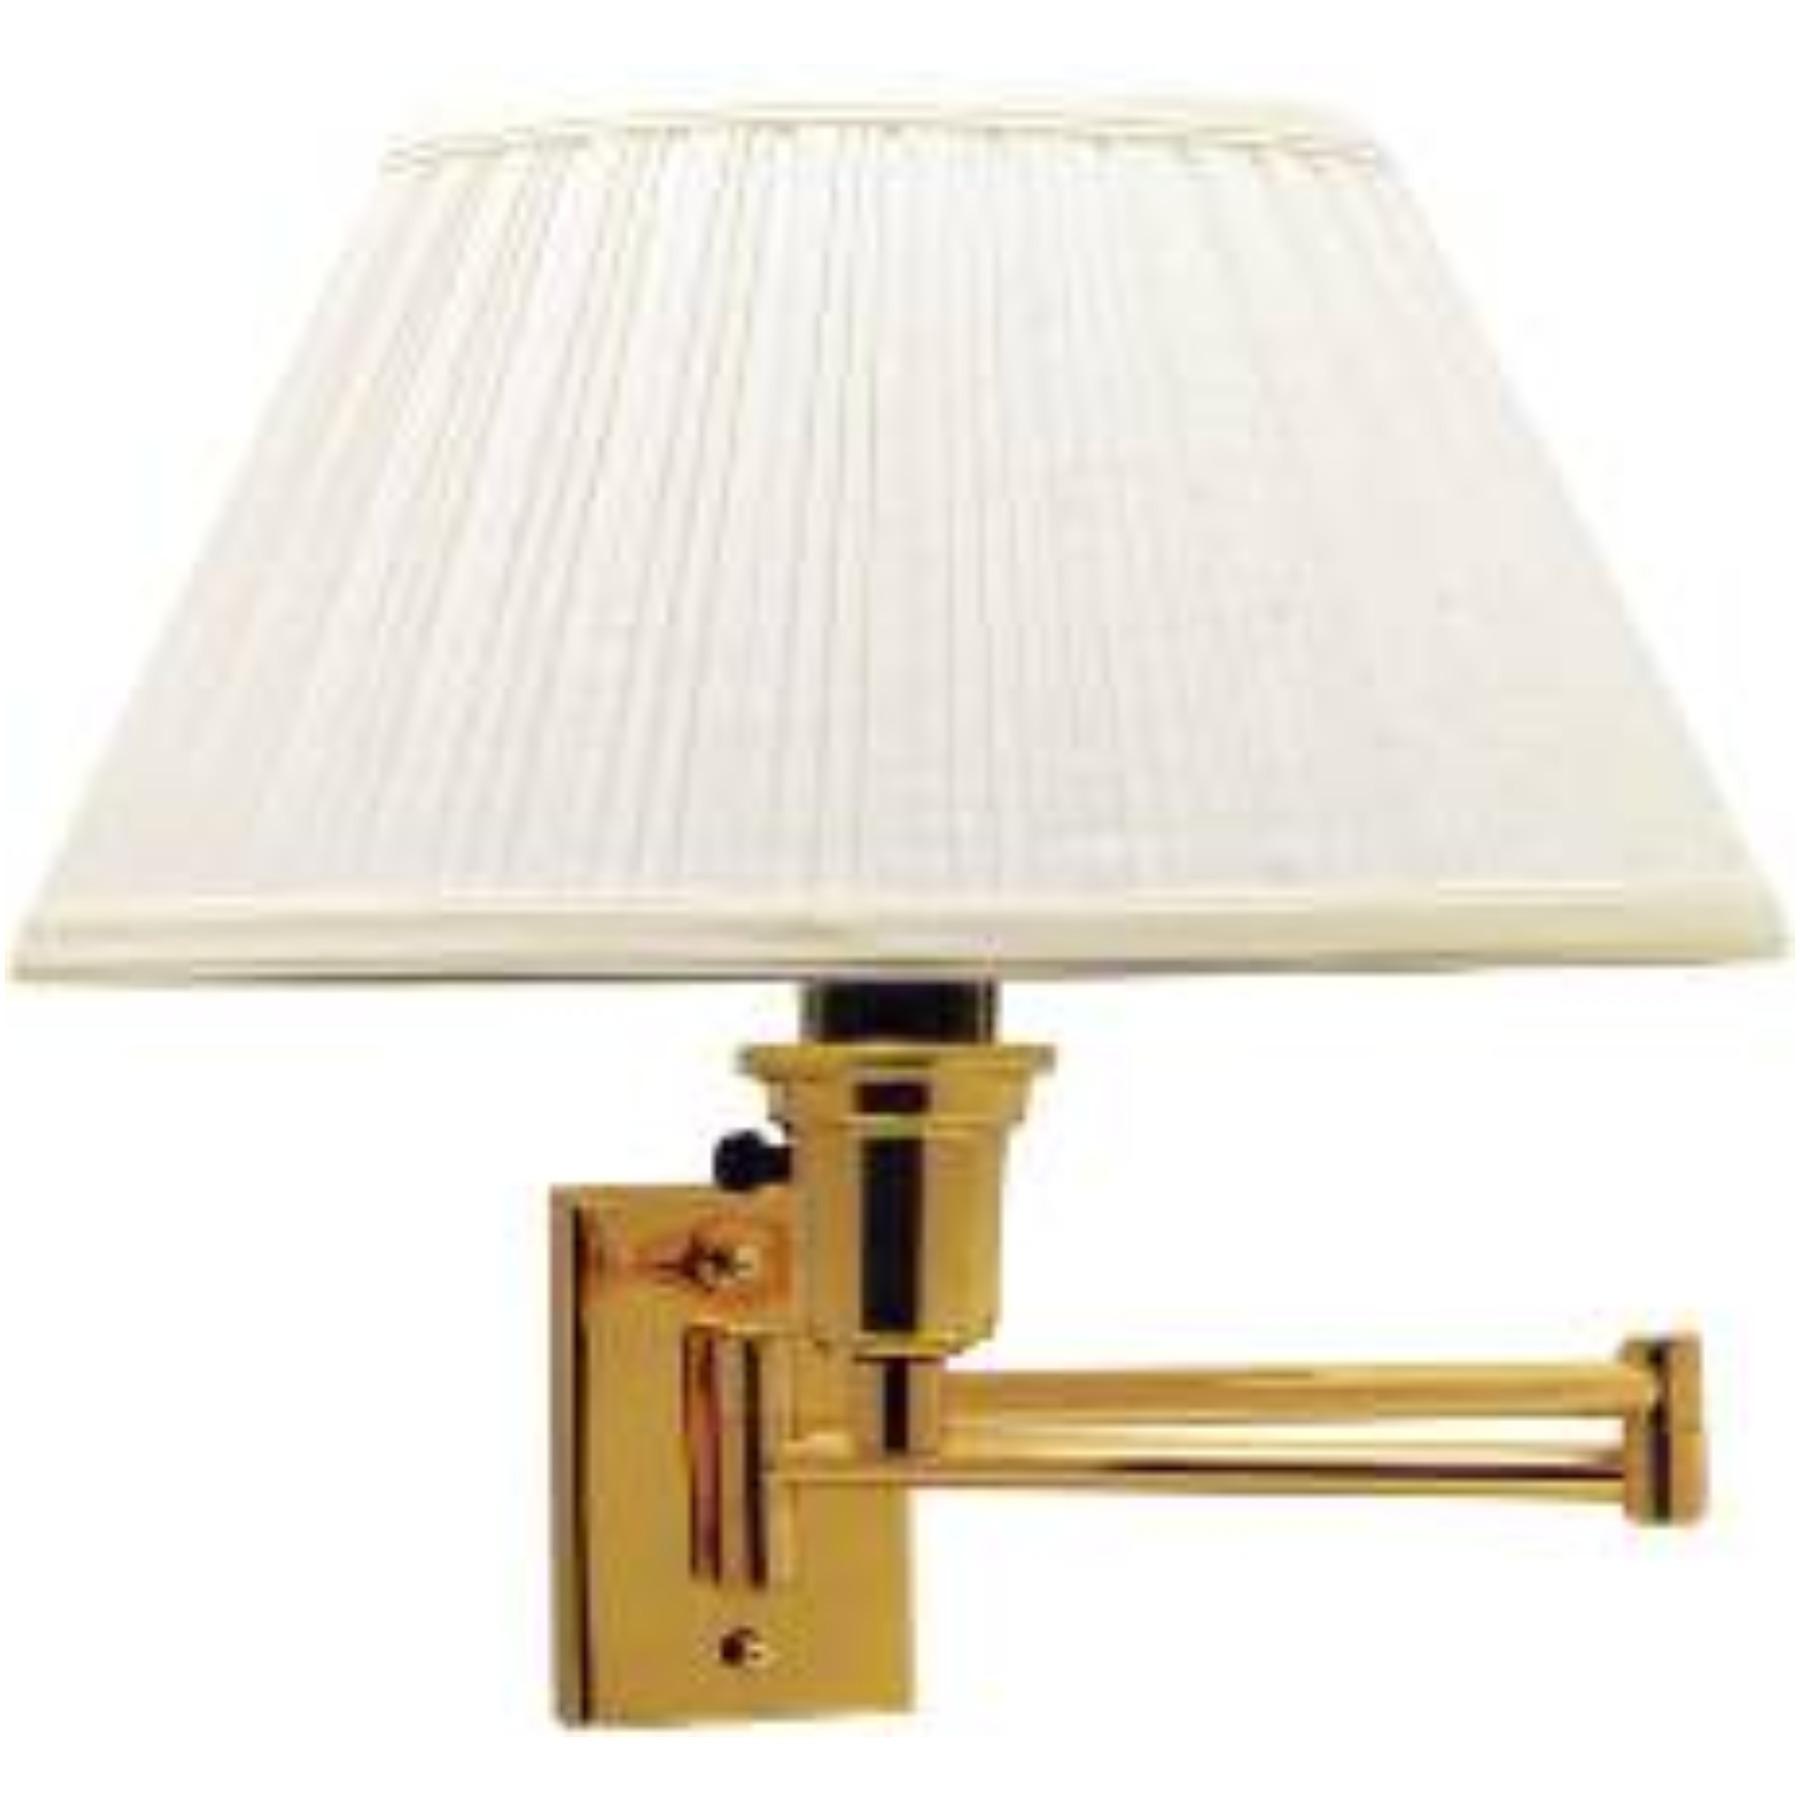 SWING ARM WALL LAMP , MAXIMUM ONE 150 WATT THREE WAY INCANDESCENT MEDIUM BASE BULB, POLISHED BRASS WITH IVORY SHADE